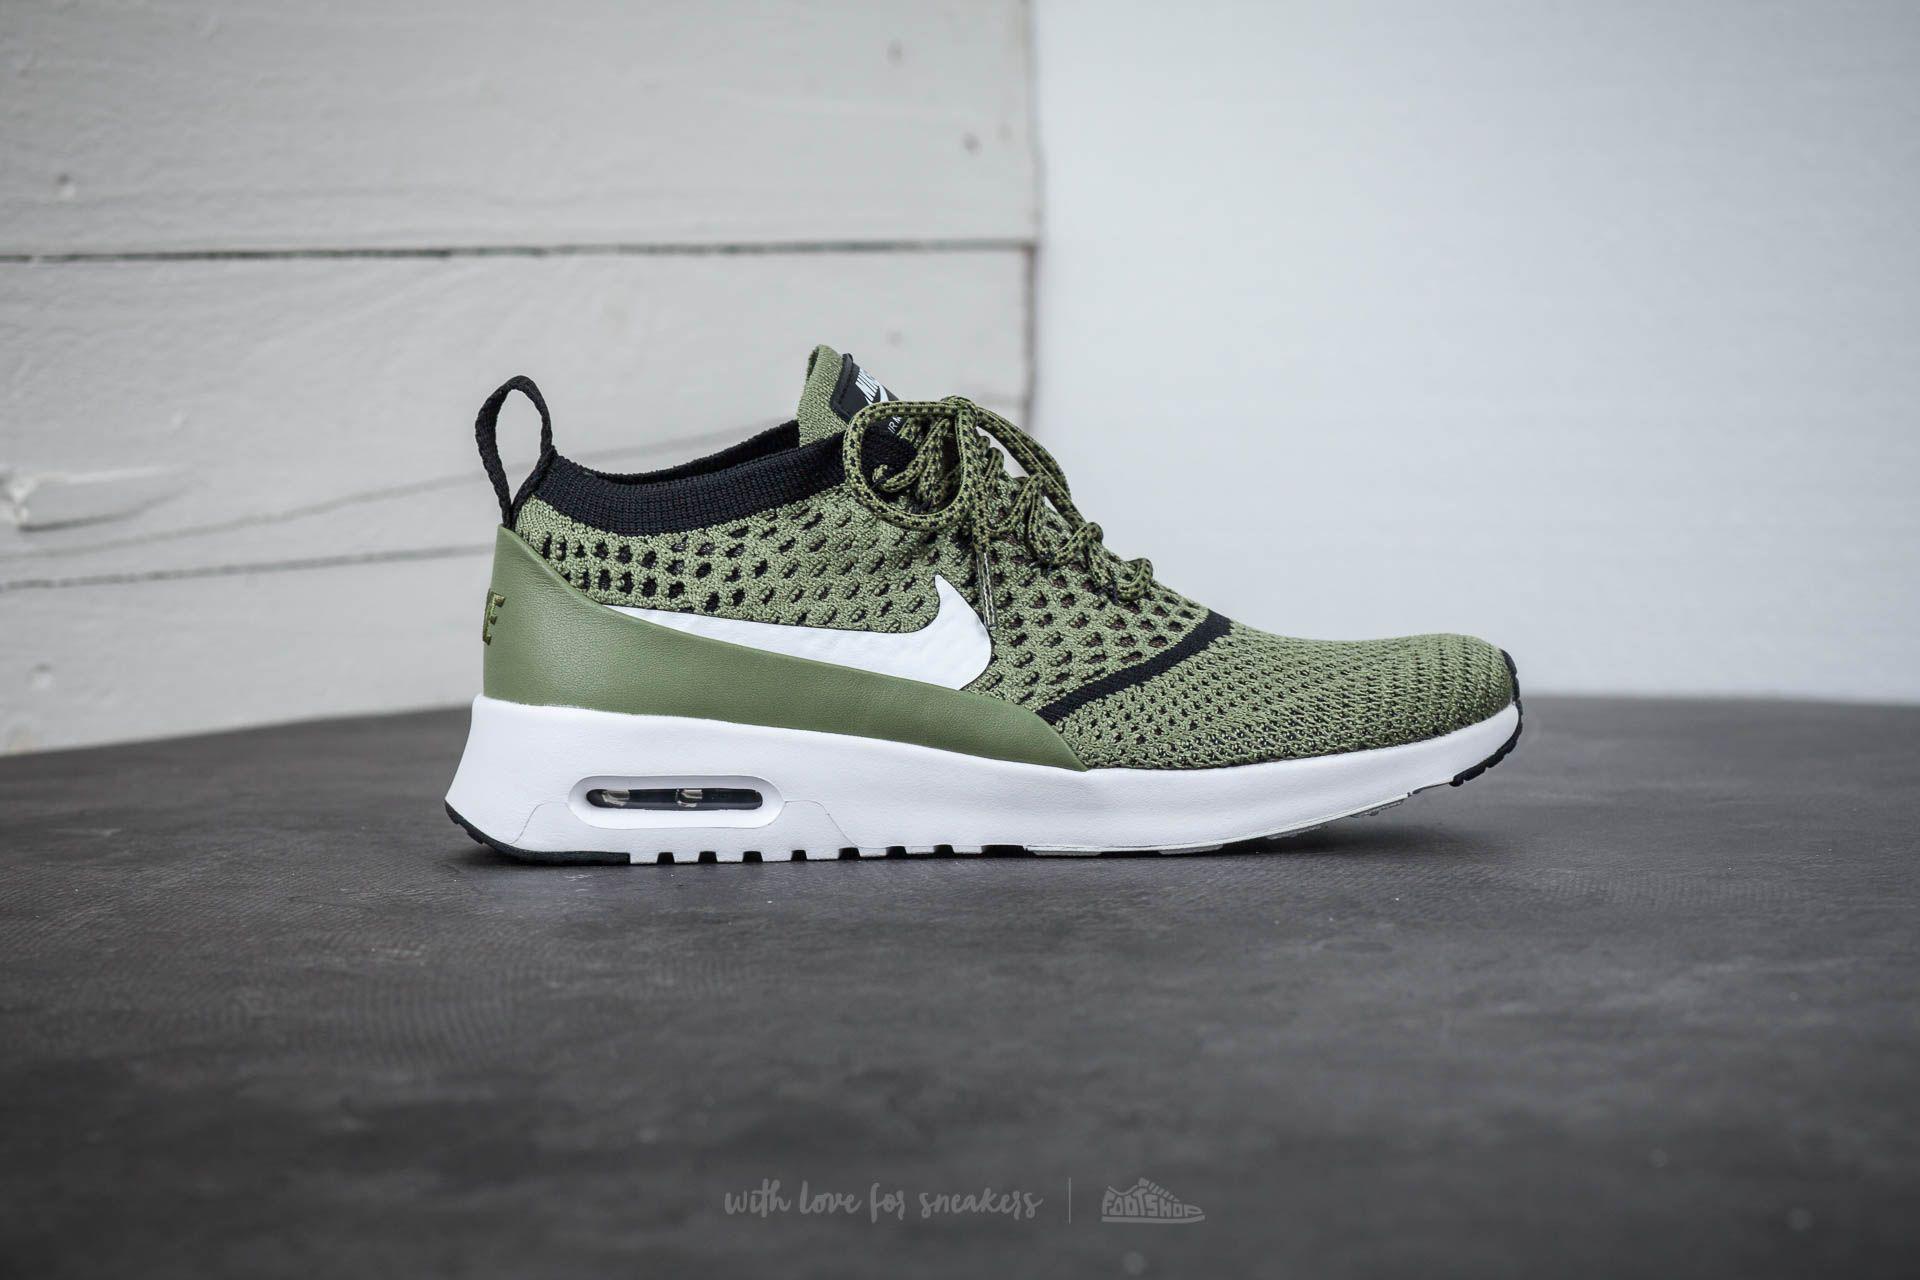 63e4e34f62 Nike Wmns Air Max Thea Ultra Flyknit Palm Green/ White-black in ...